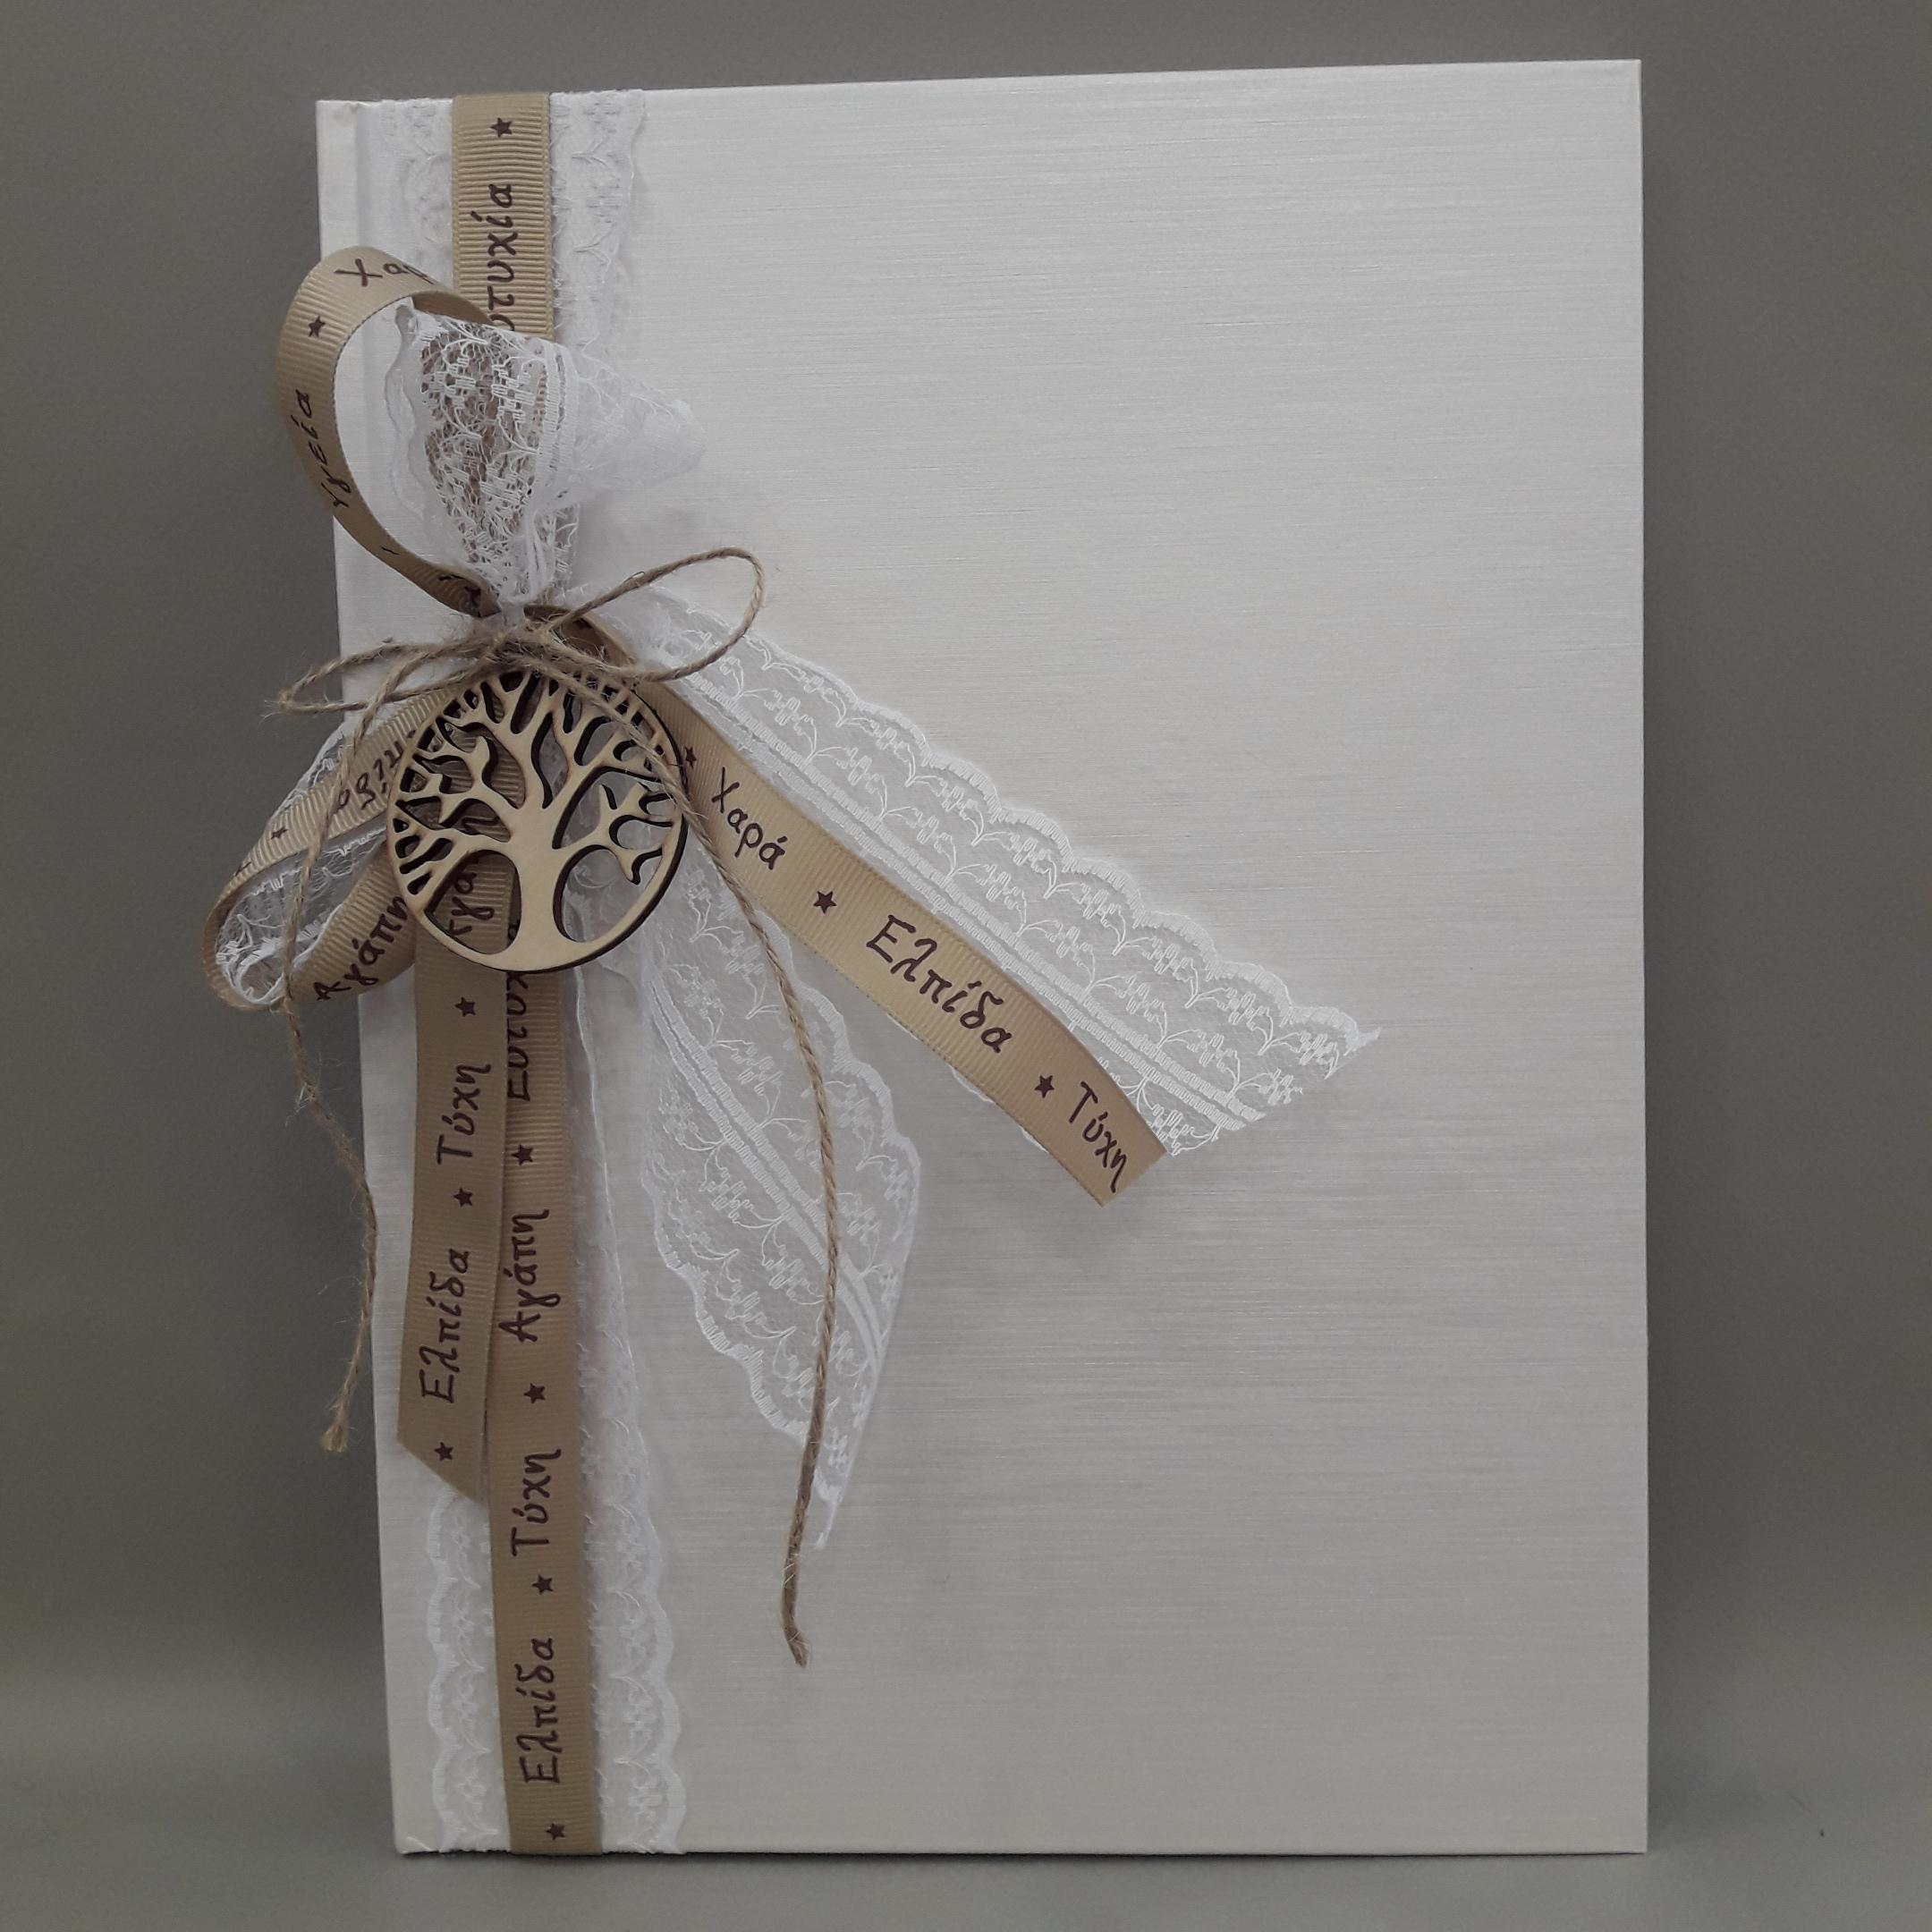 c3366436ad87 βιβλιο ευχων γαμου με ξυλινο δεντρο ζωης και κορδελα με ευχες